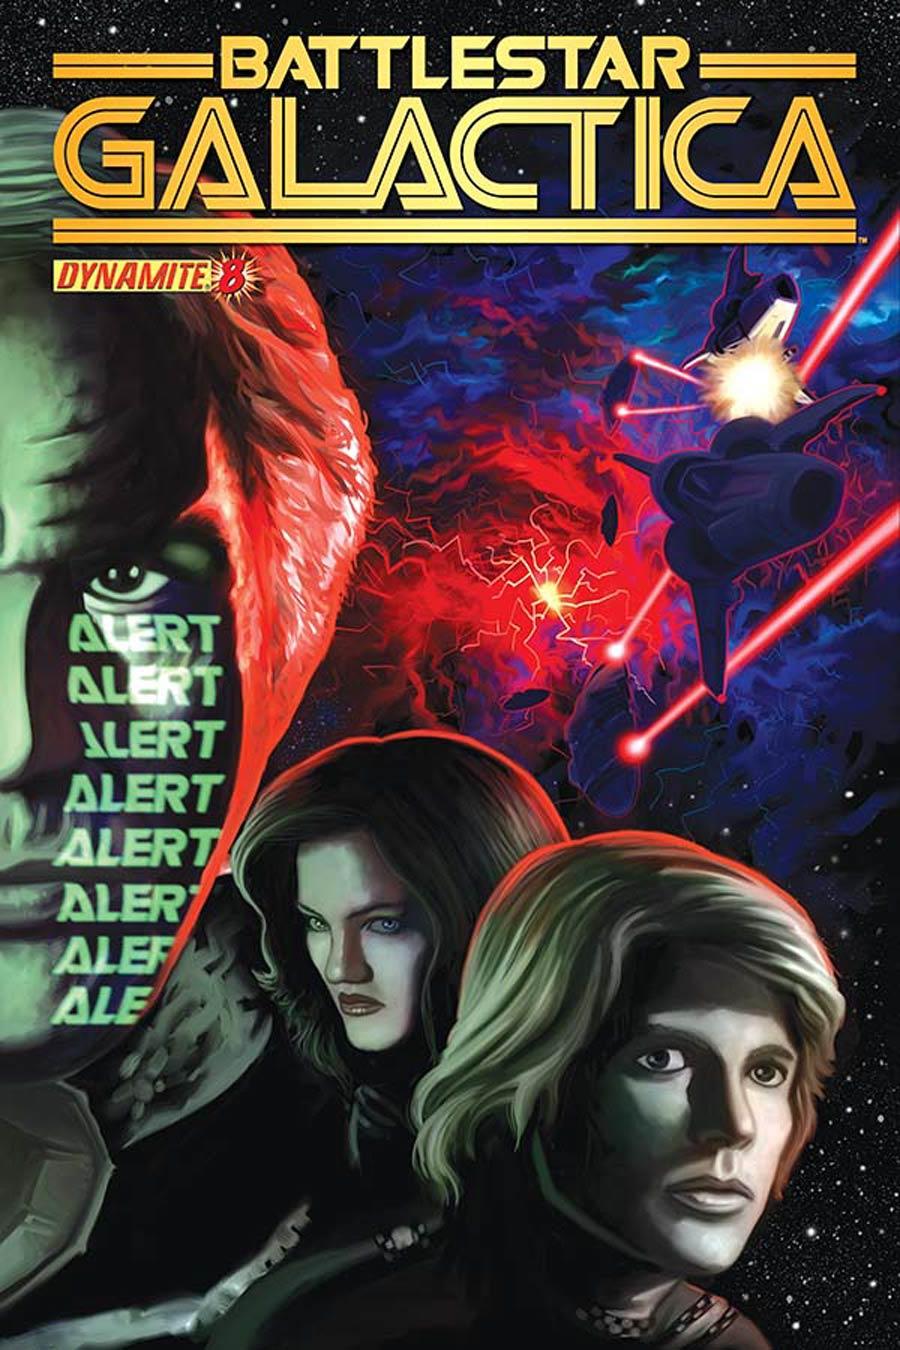 Battlestar Galactica Vol 5 #8 Cover A Regular Colton Worley Cover